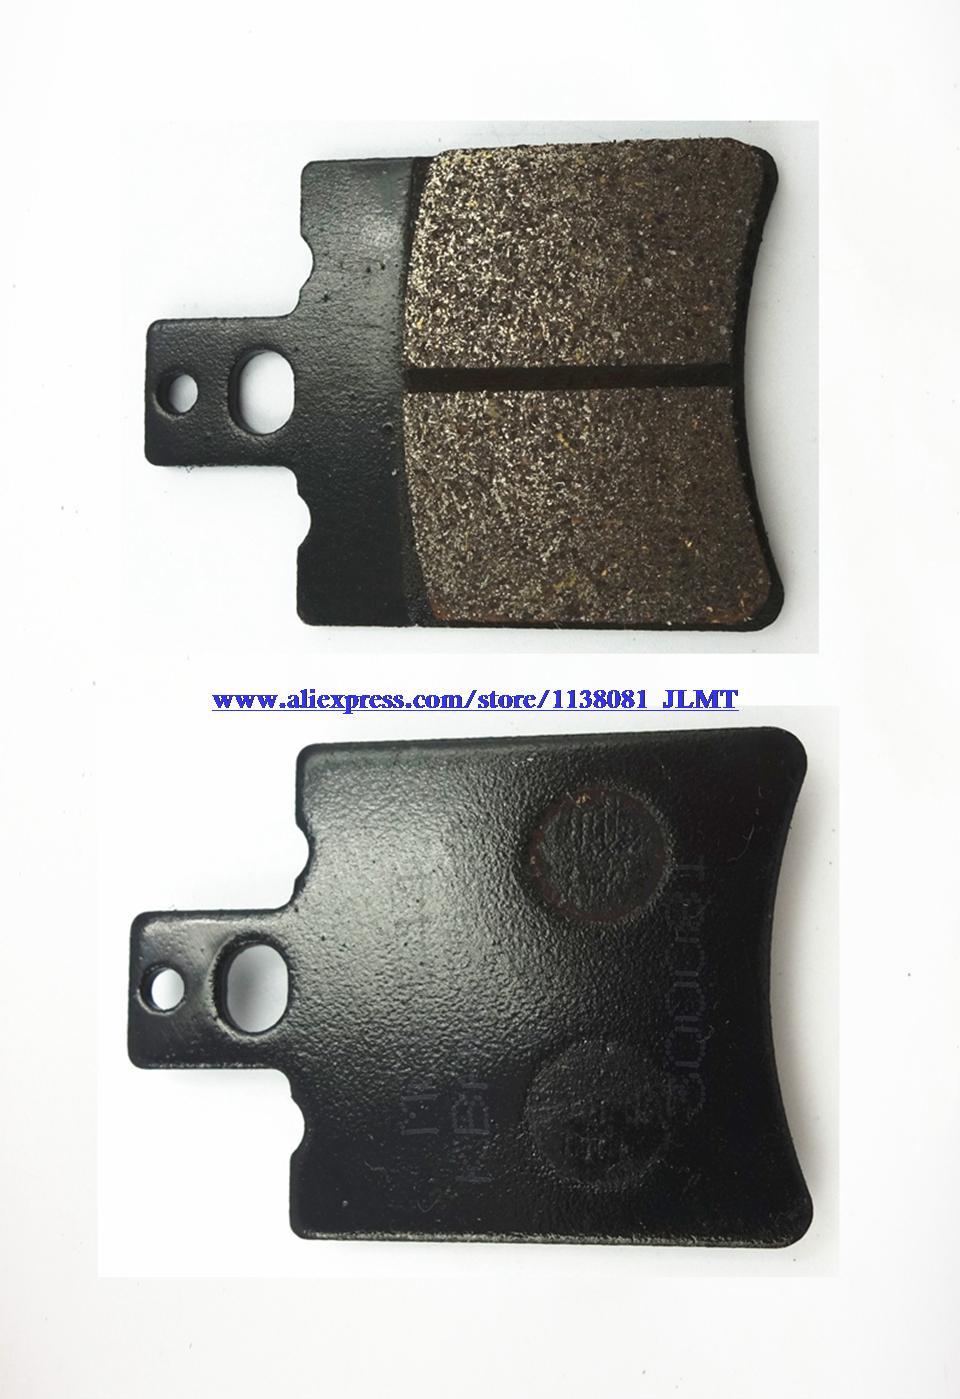 Тормозные диски для мотоцикла 1985/1986/1987 GILERA 250 RX /RX RX250 1984/1988 JLMT